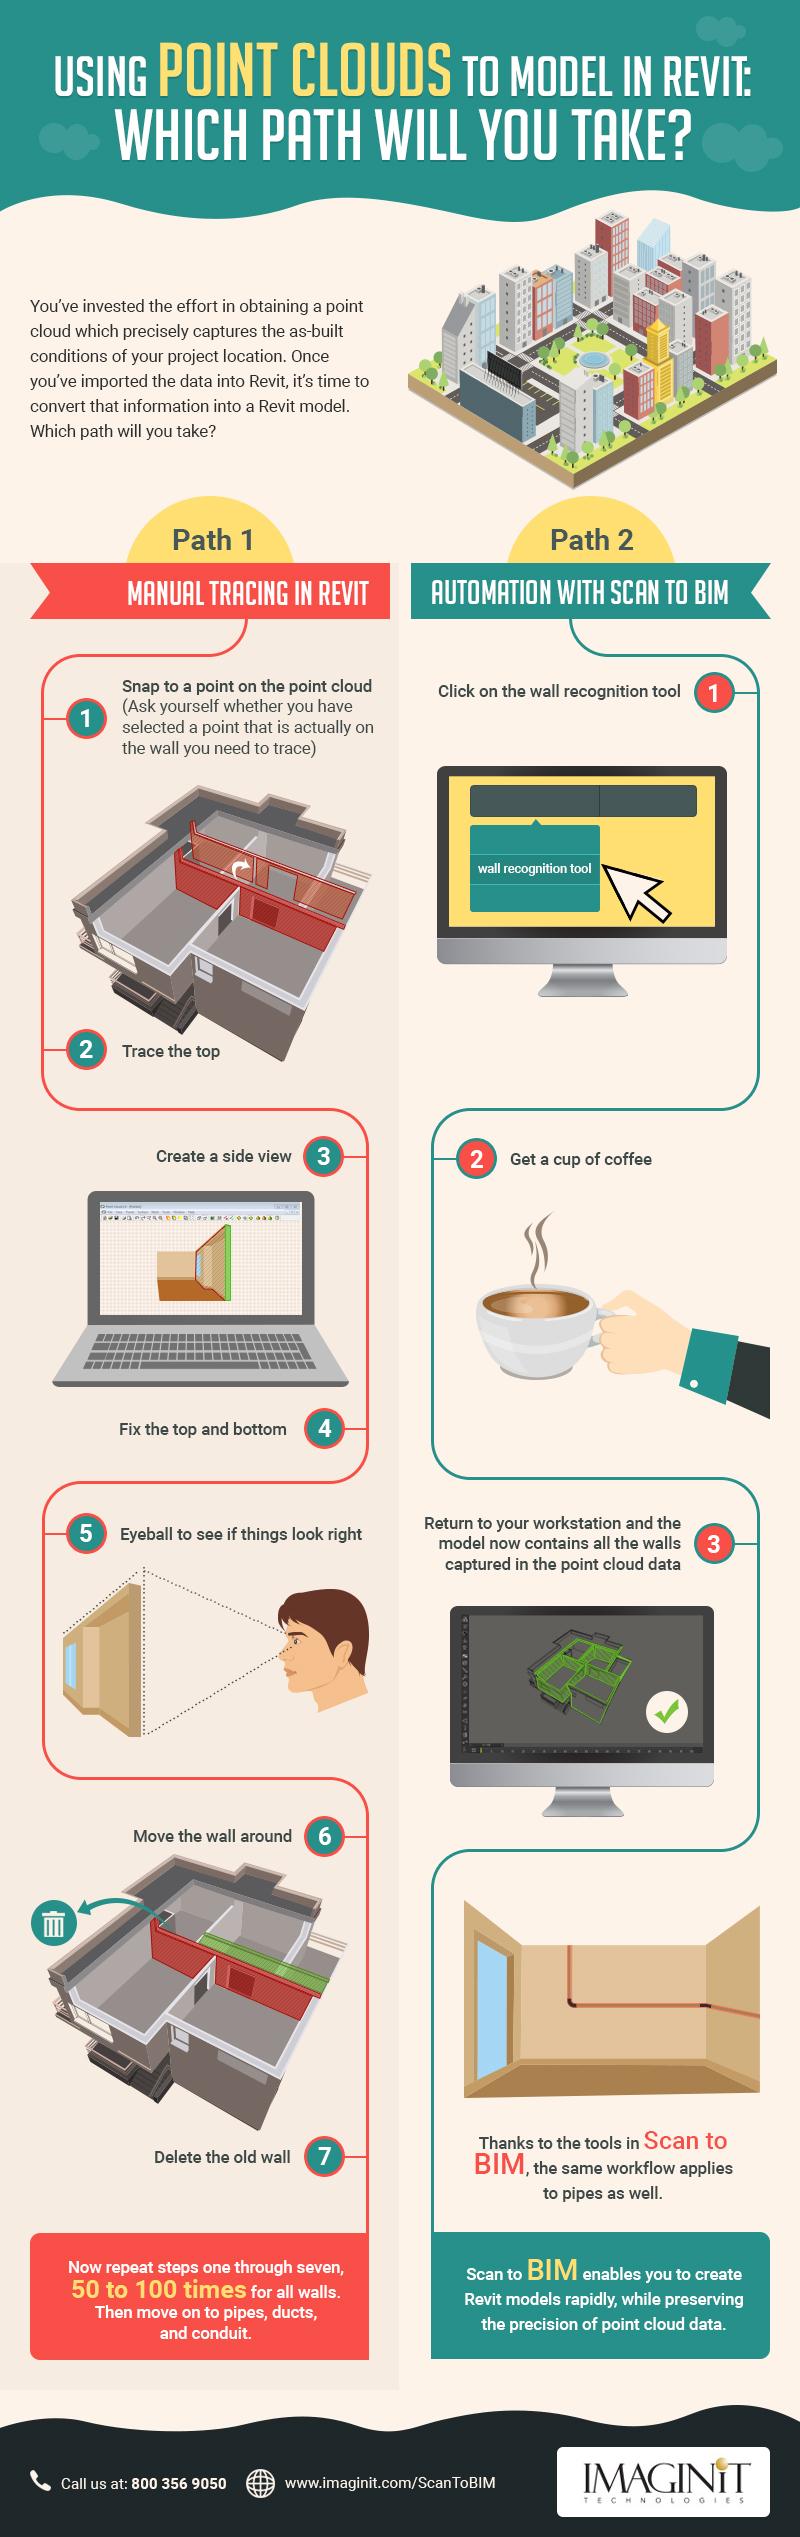 CB_ScantoBIM_Infographic